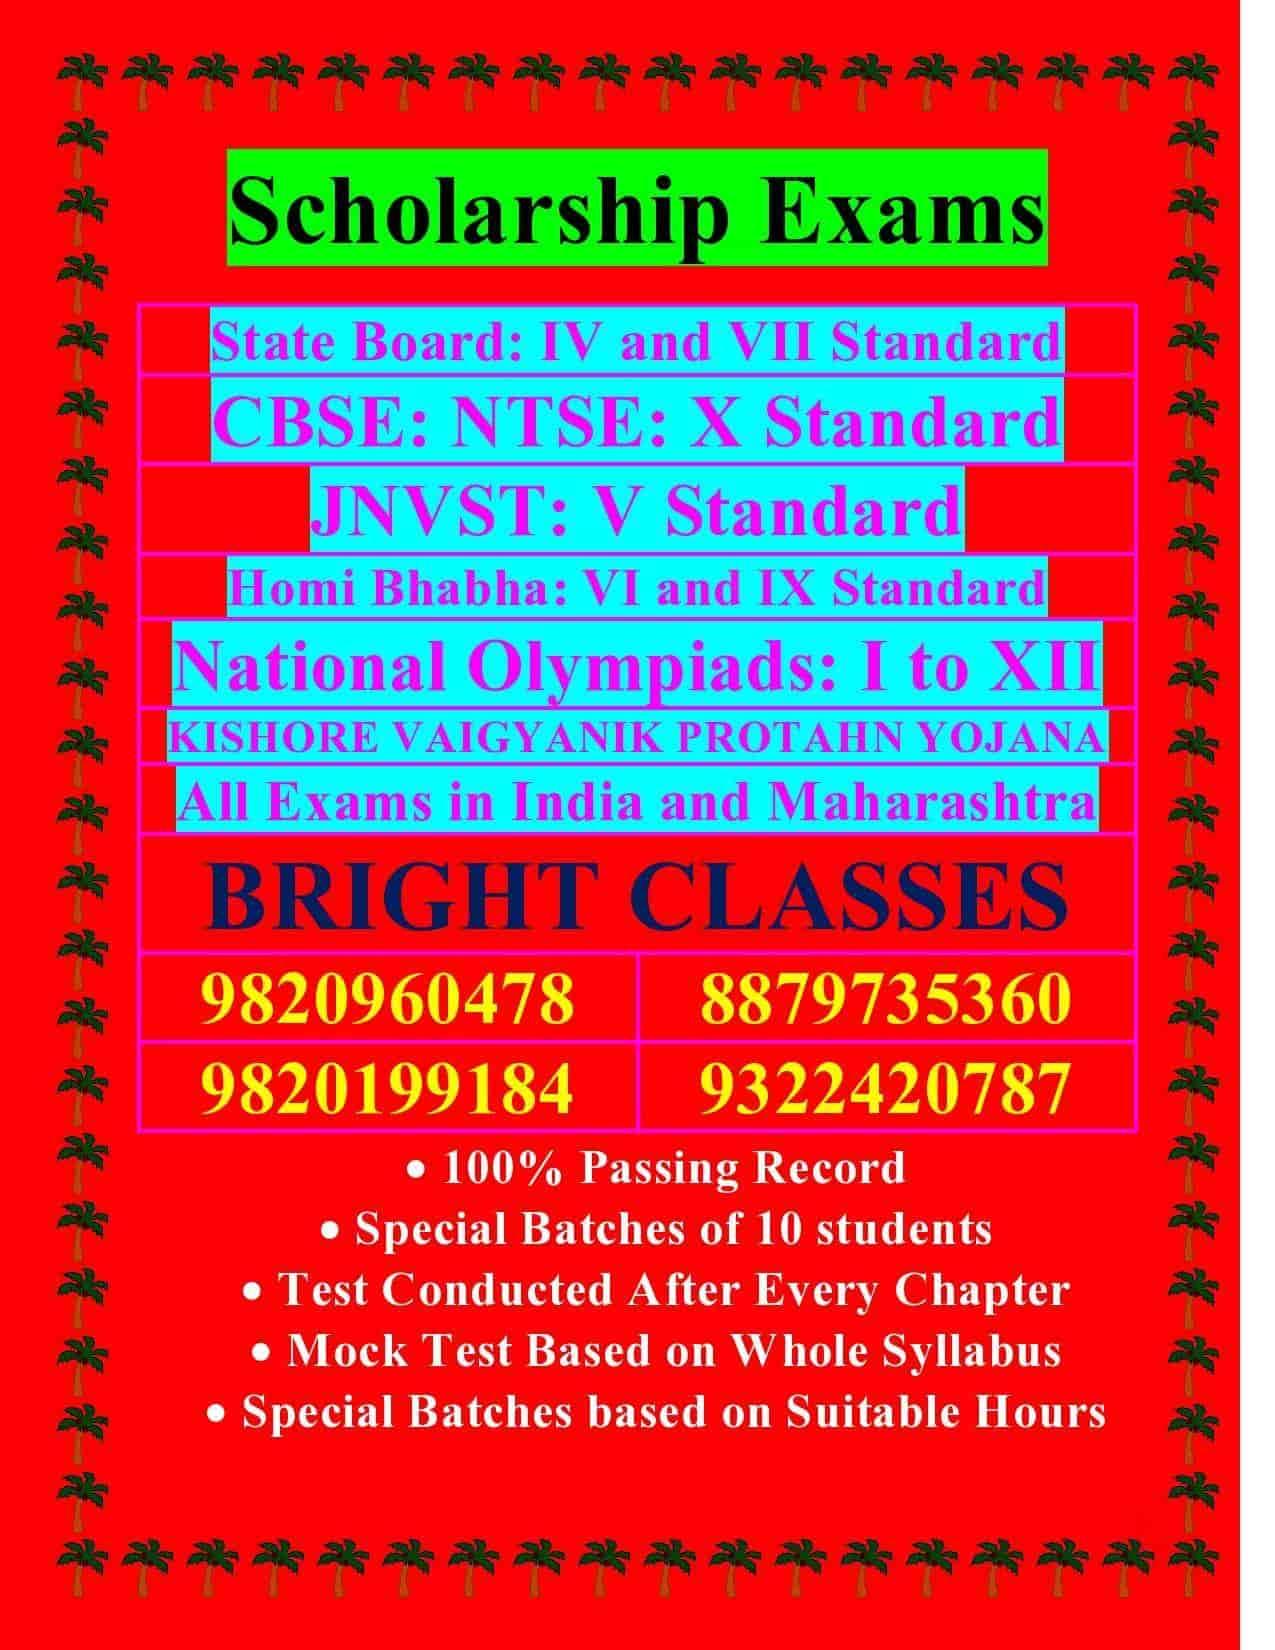 Bright Classes, Mumbai Central - Tutorials in Mumbai - Justdial